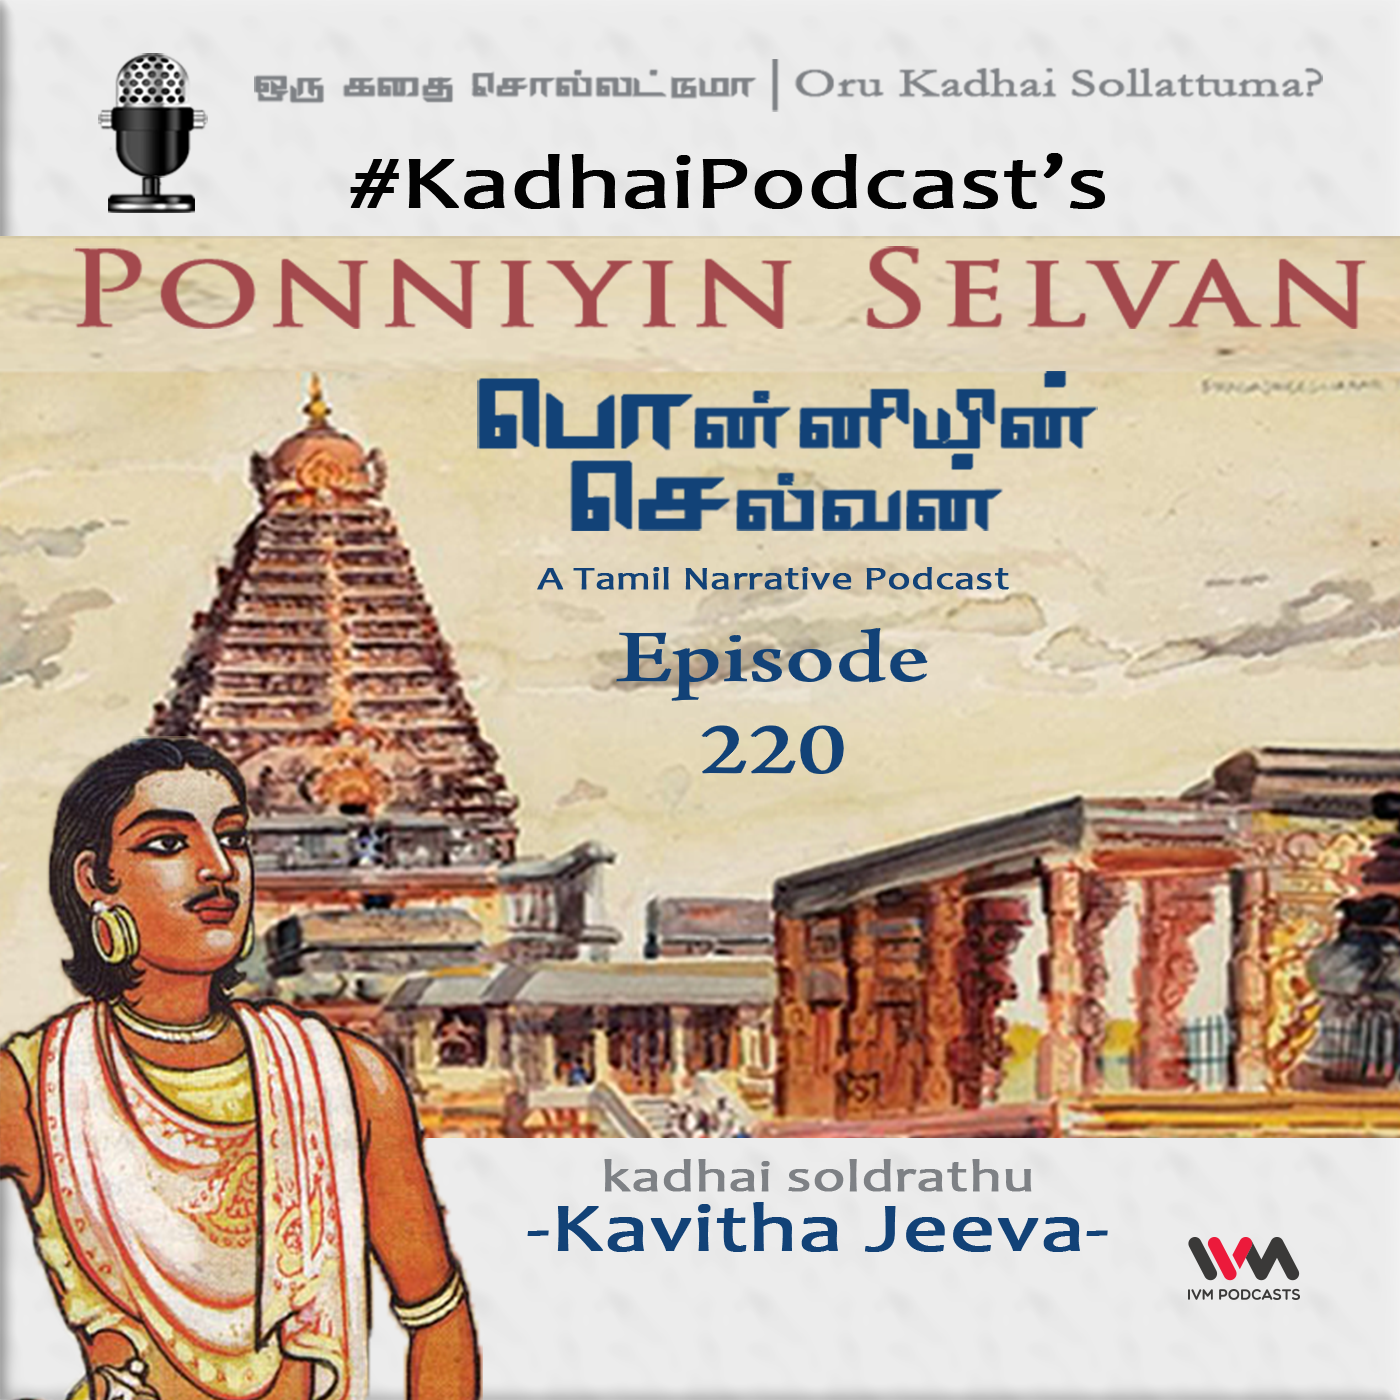 KadhaiPodcast's Ponniyin Selvan - Episode # 220